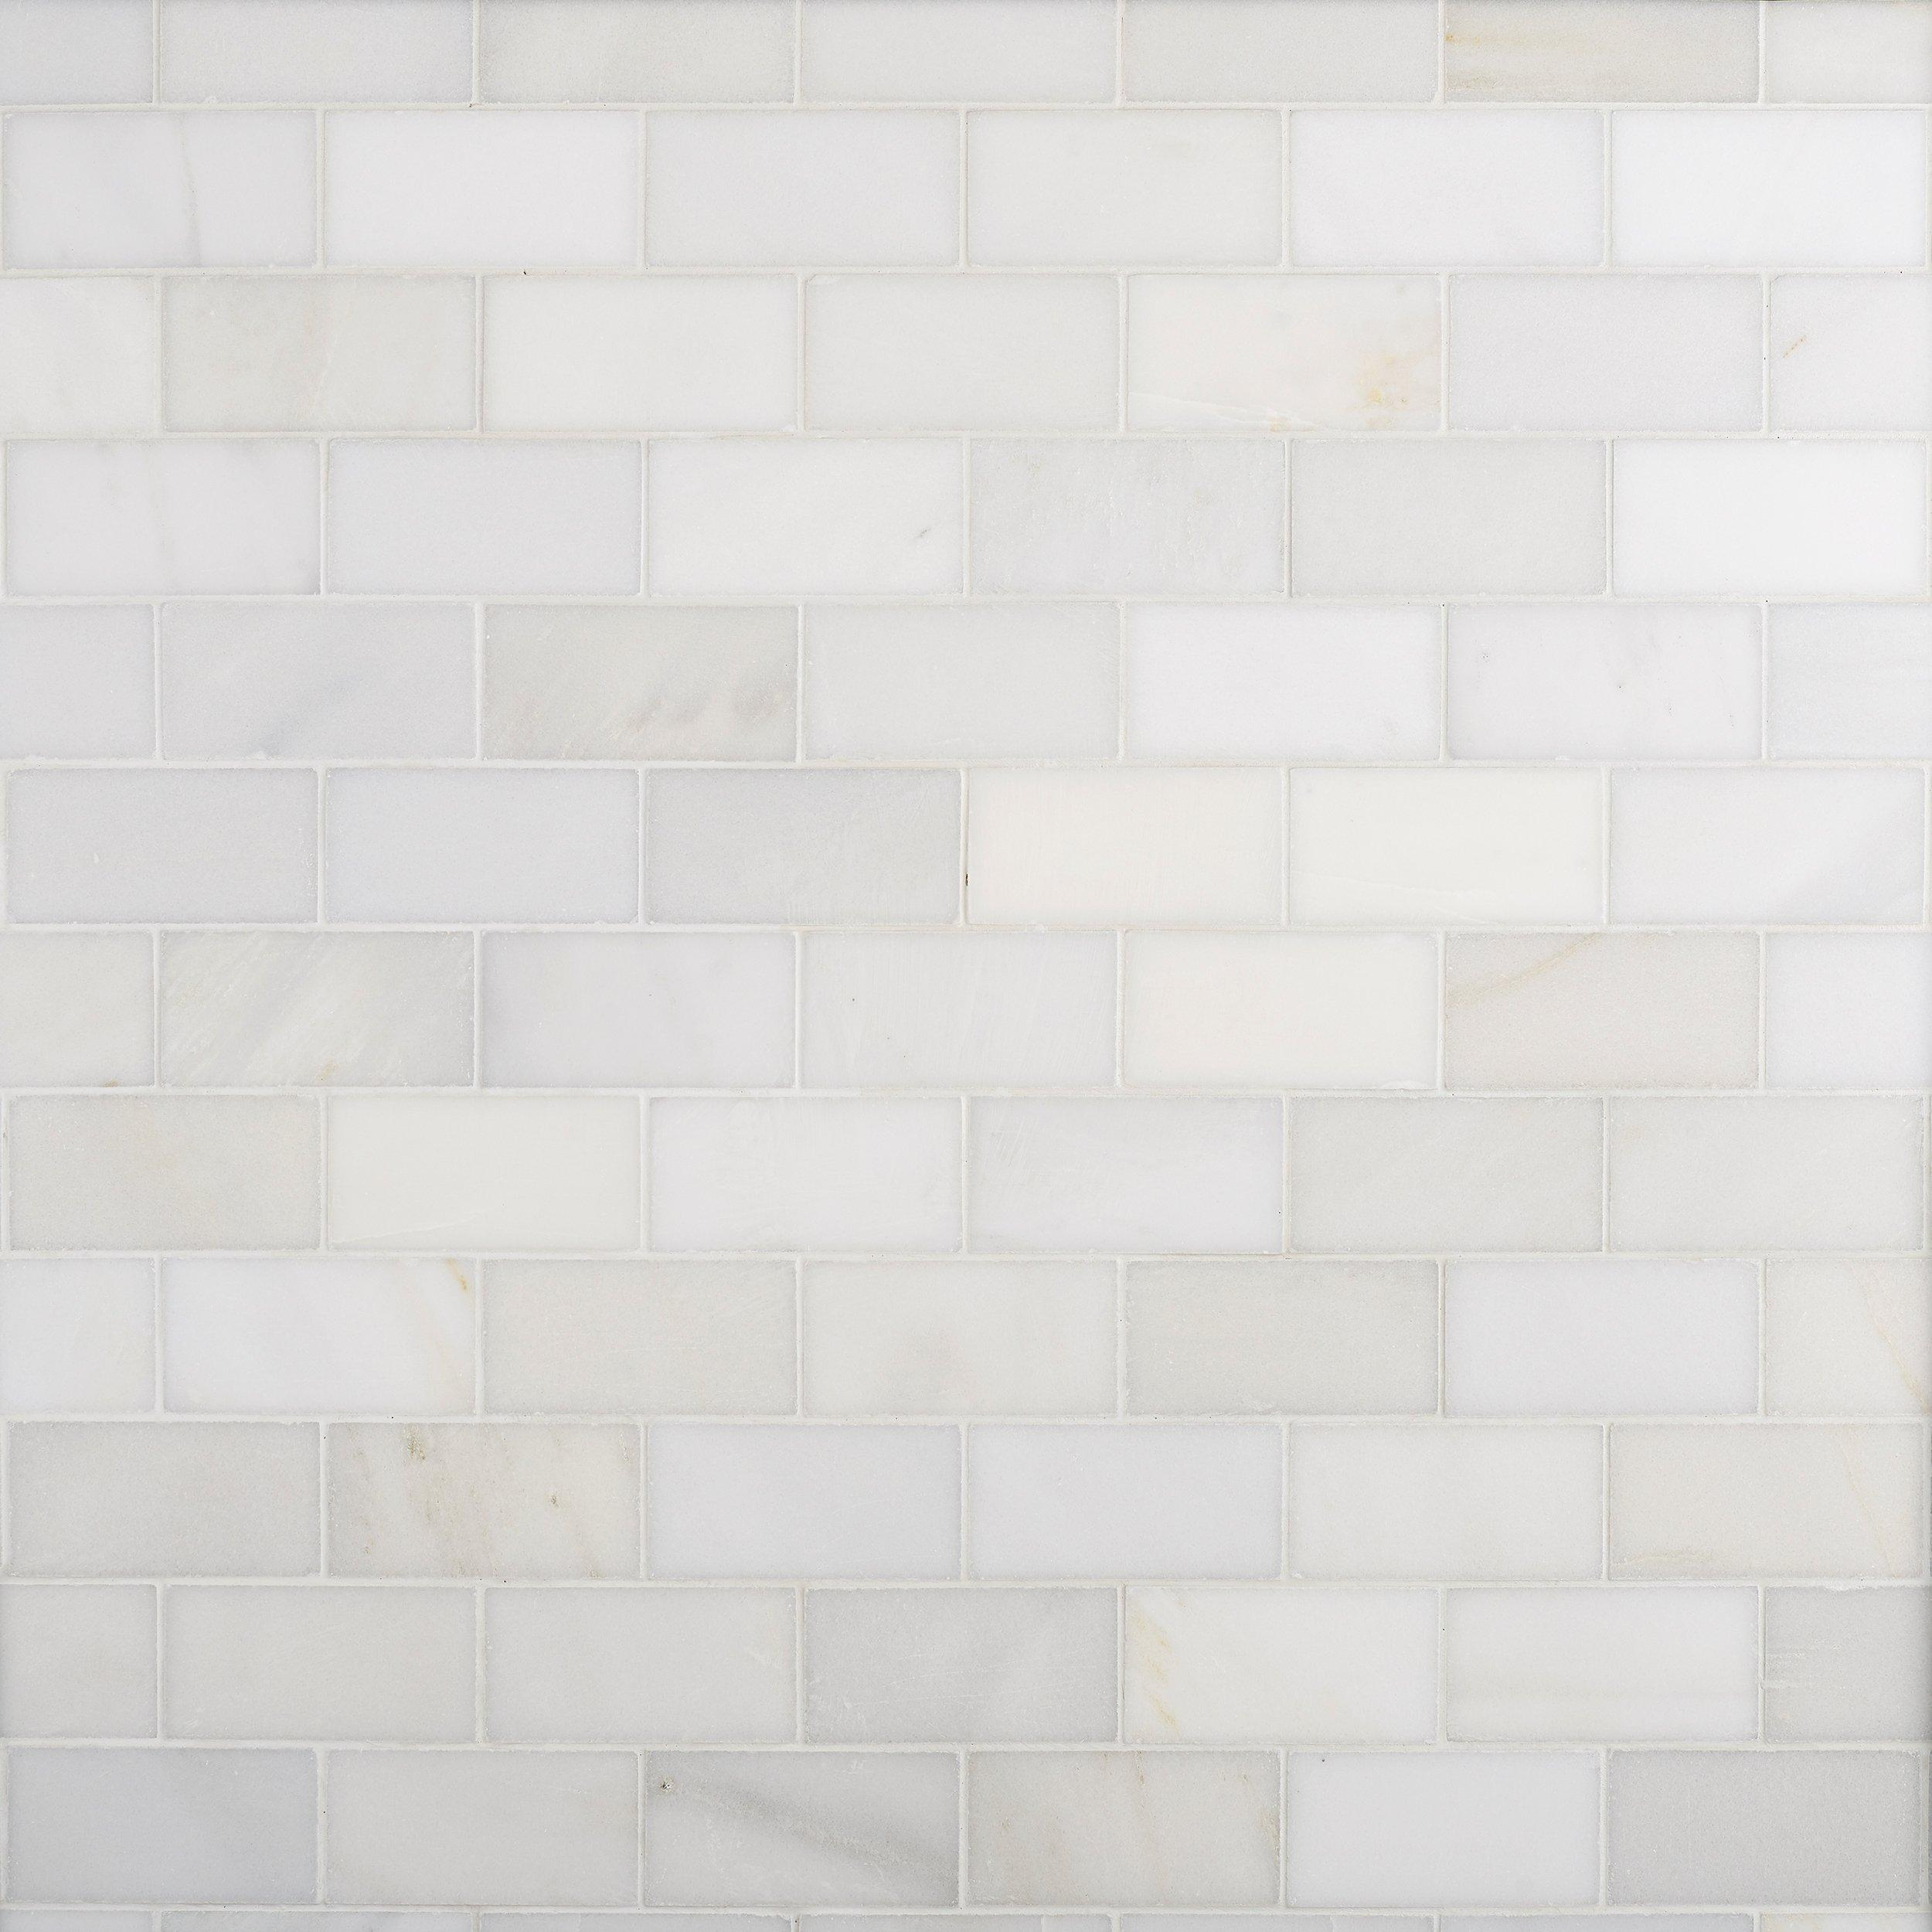 Carrara White Honed Marble Tile 3in x 6in 931100279 Floor